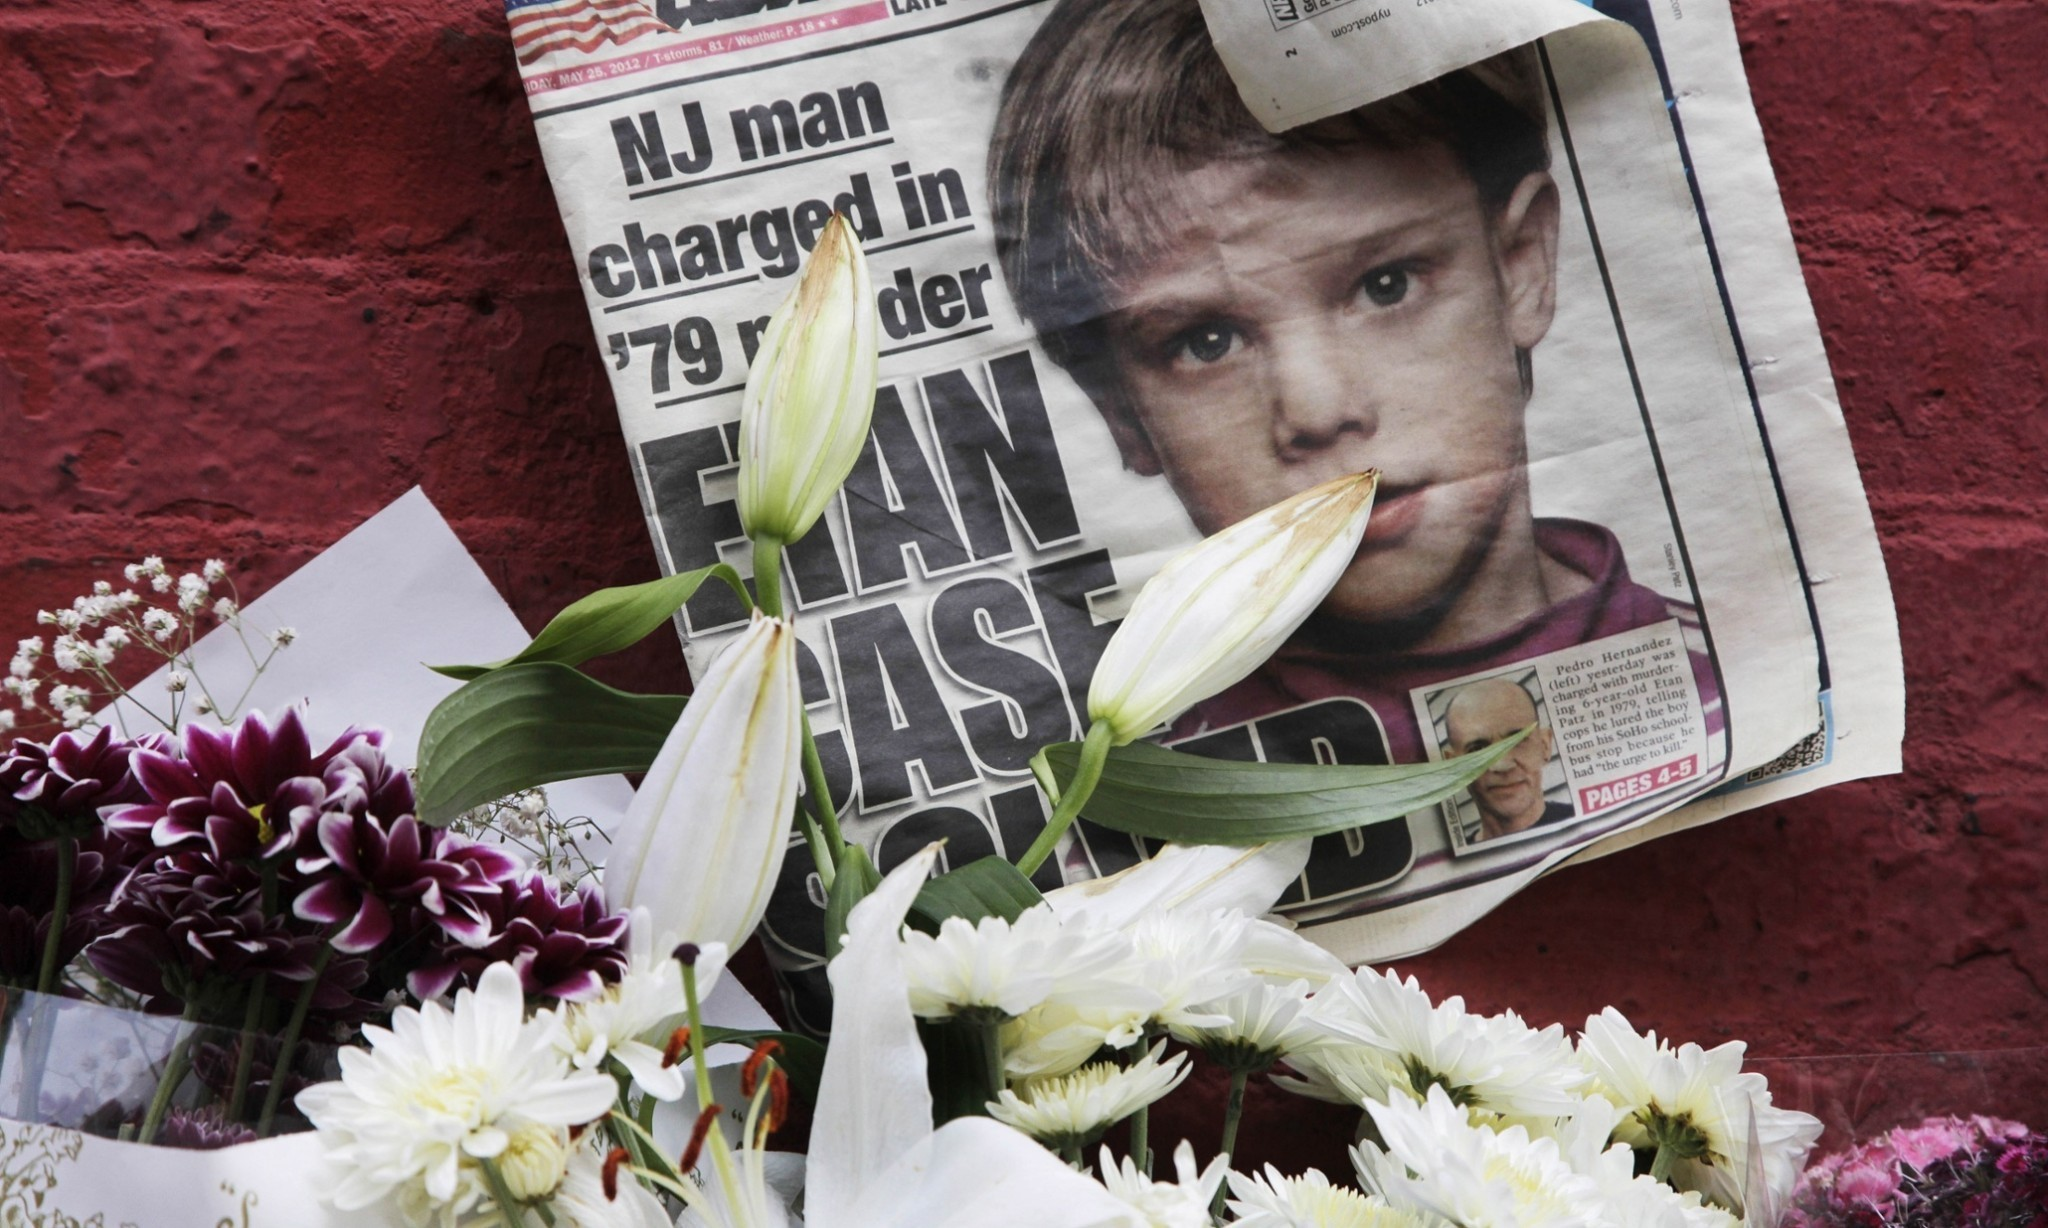 Etan Patz murder trial begins 35 years after 'milk carton boy' disappeared